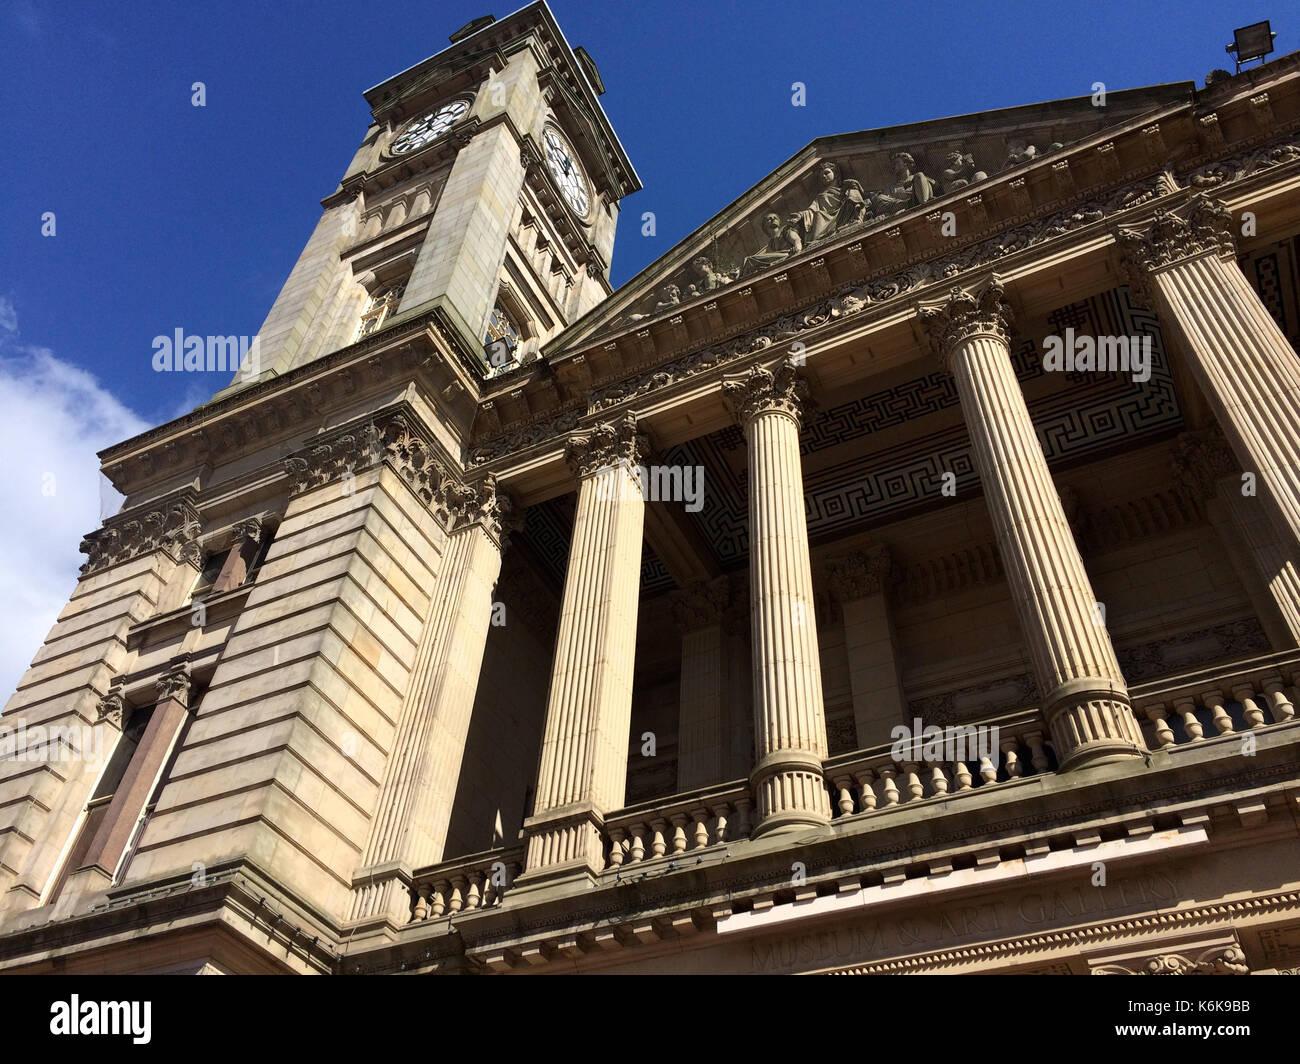 Birmingham Museum and Art Gallery (BMAG) - Stock Image